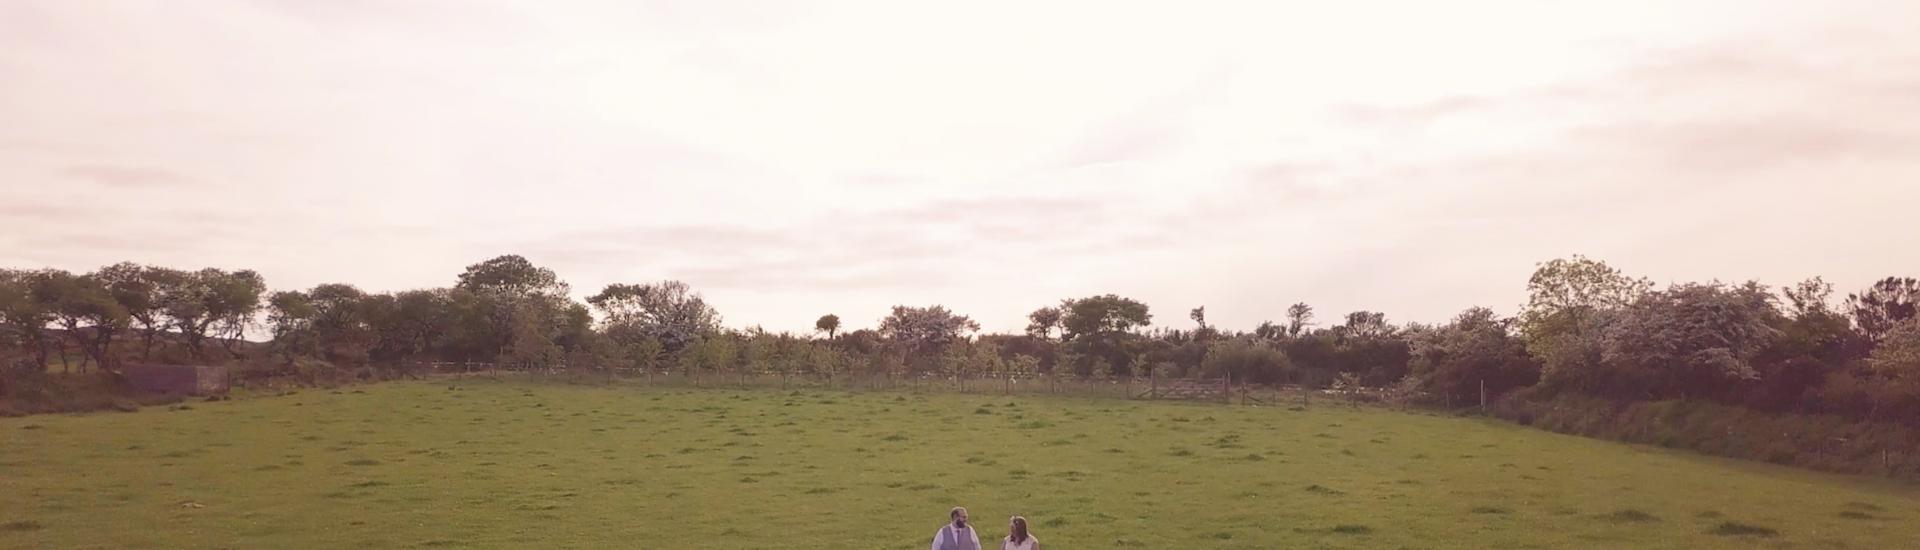 cornish camels wedding video